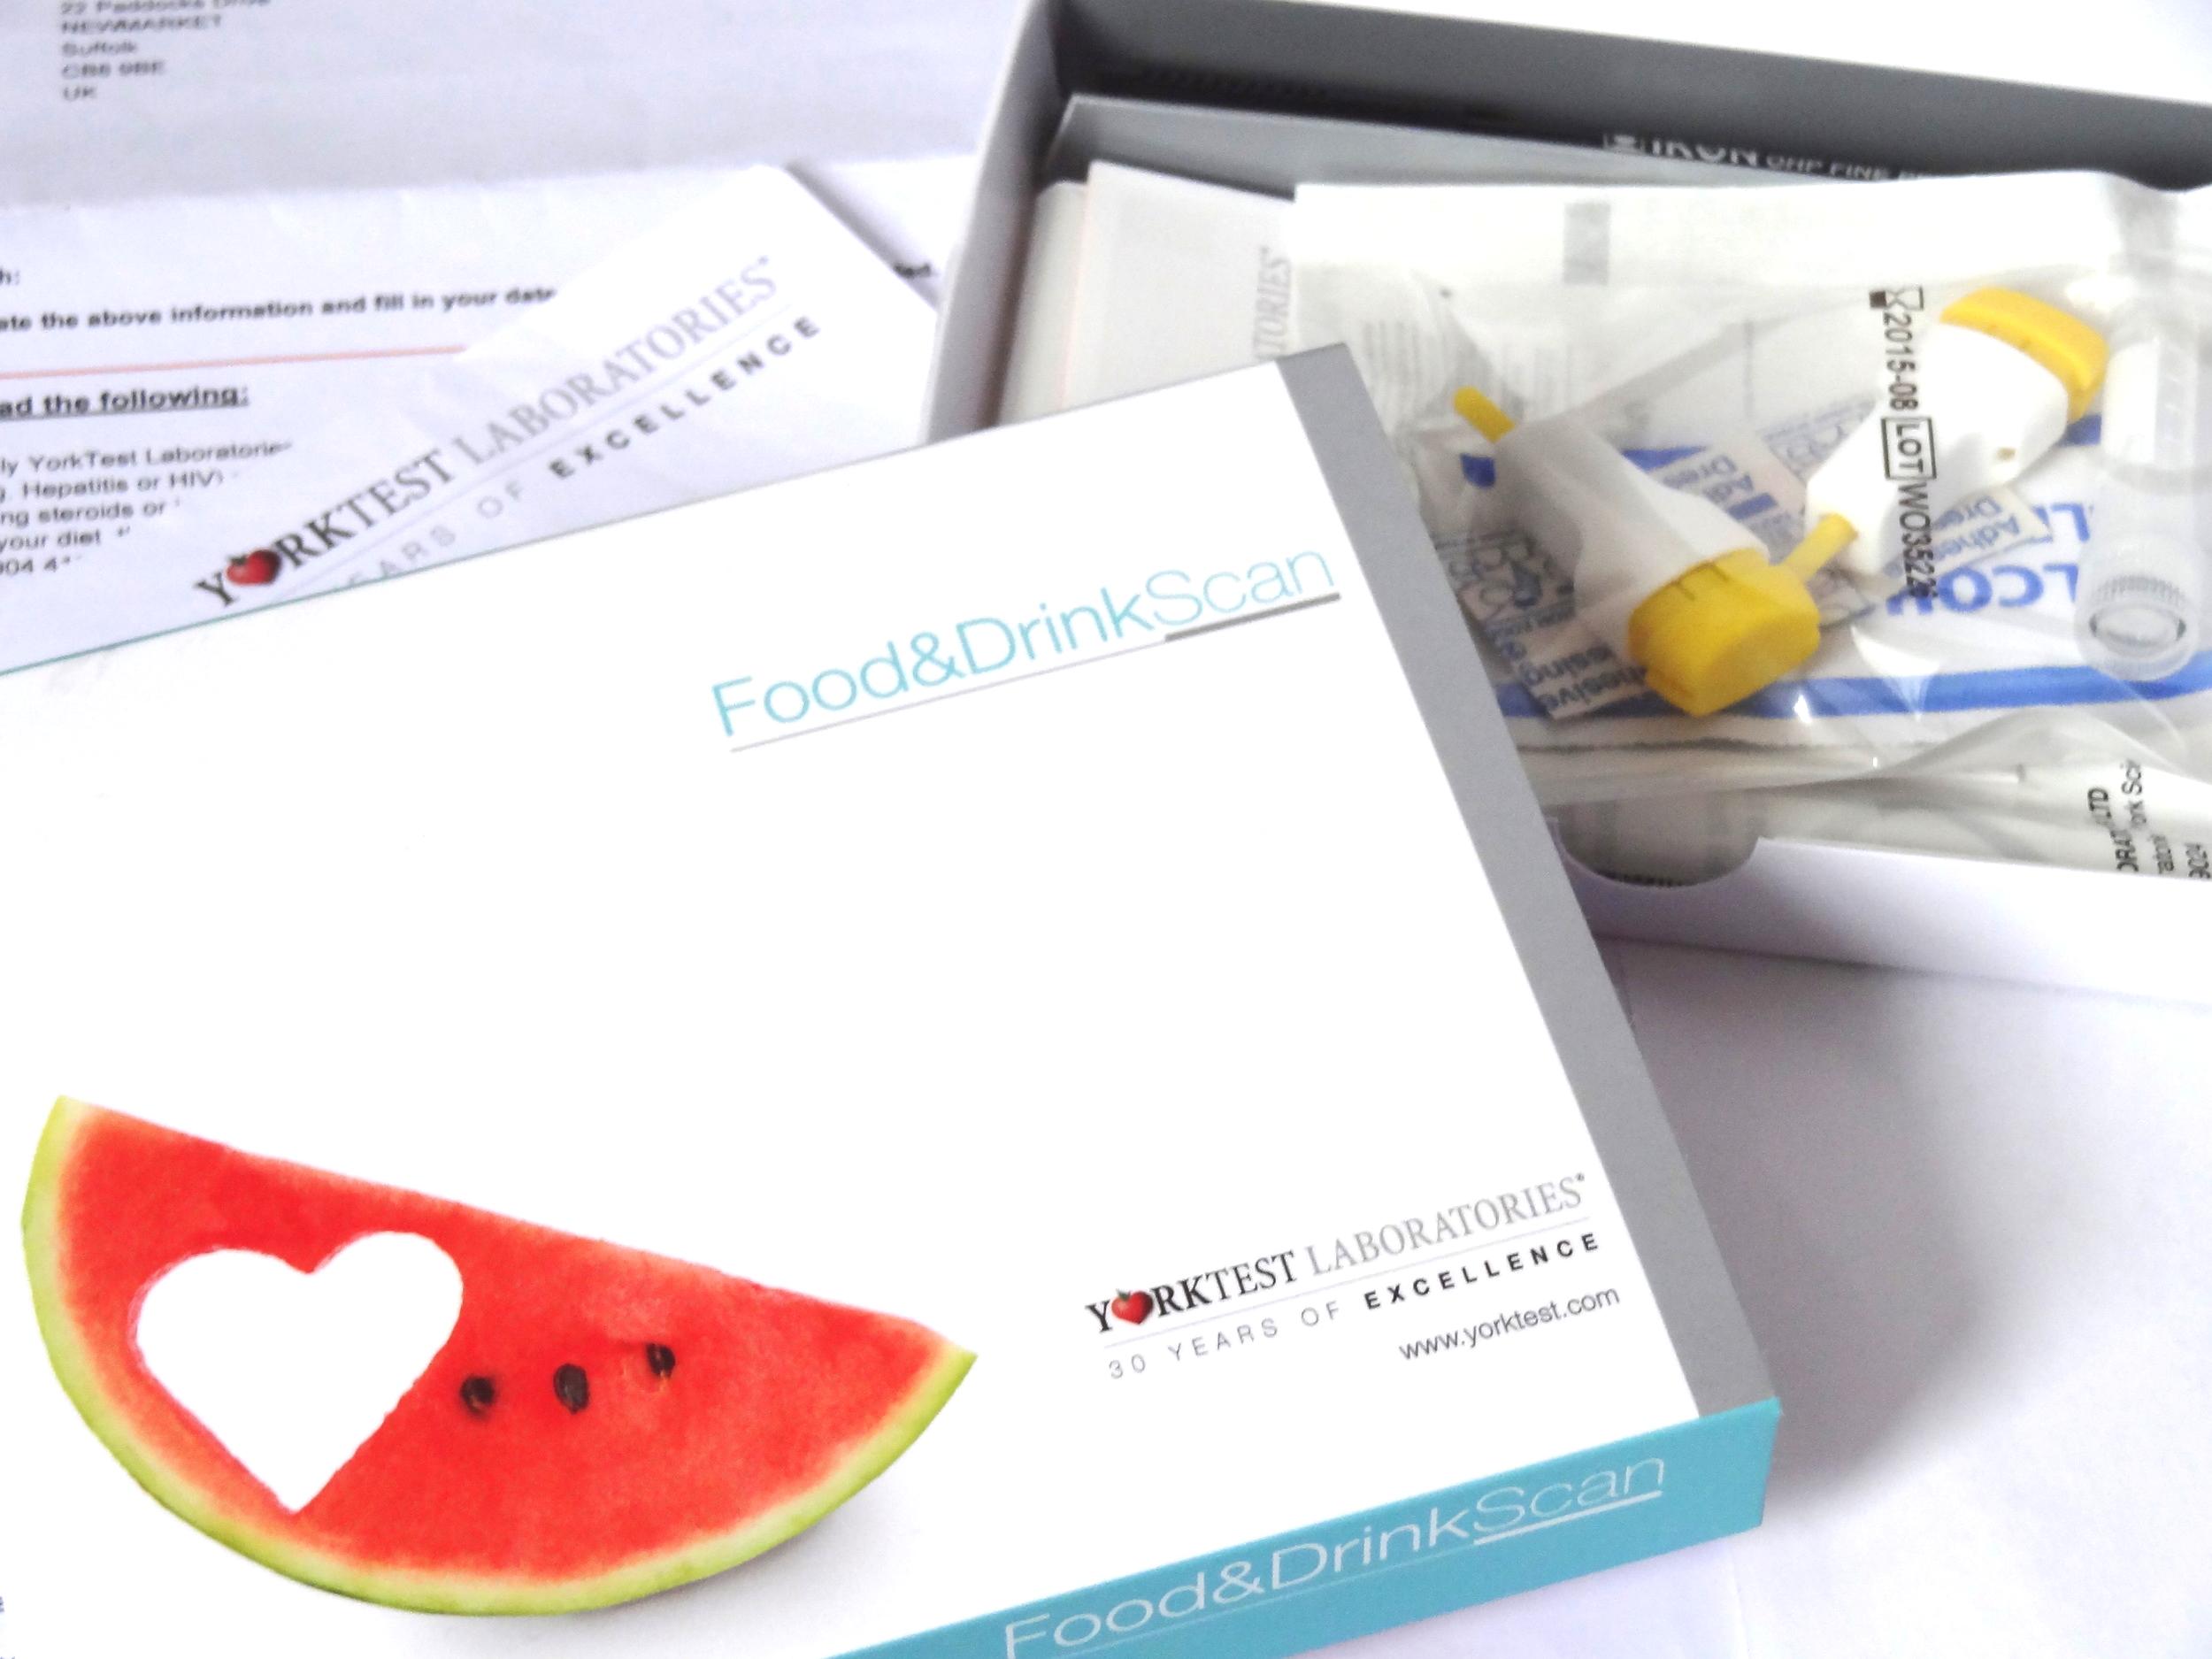 York-Test-Food-Intolerance-Testing-Kit